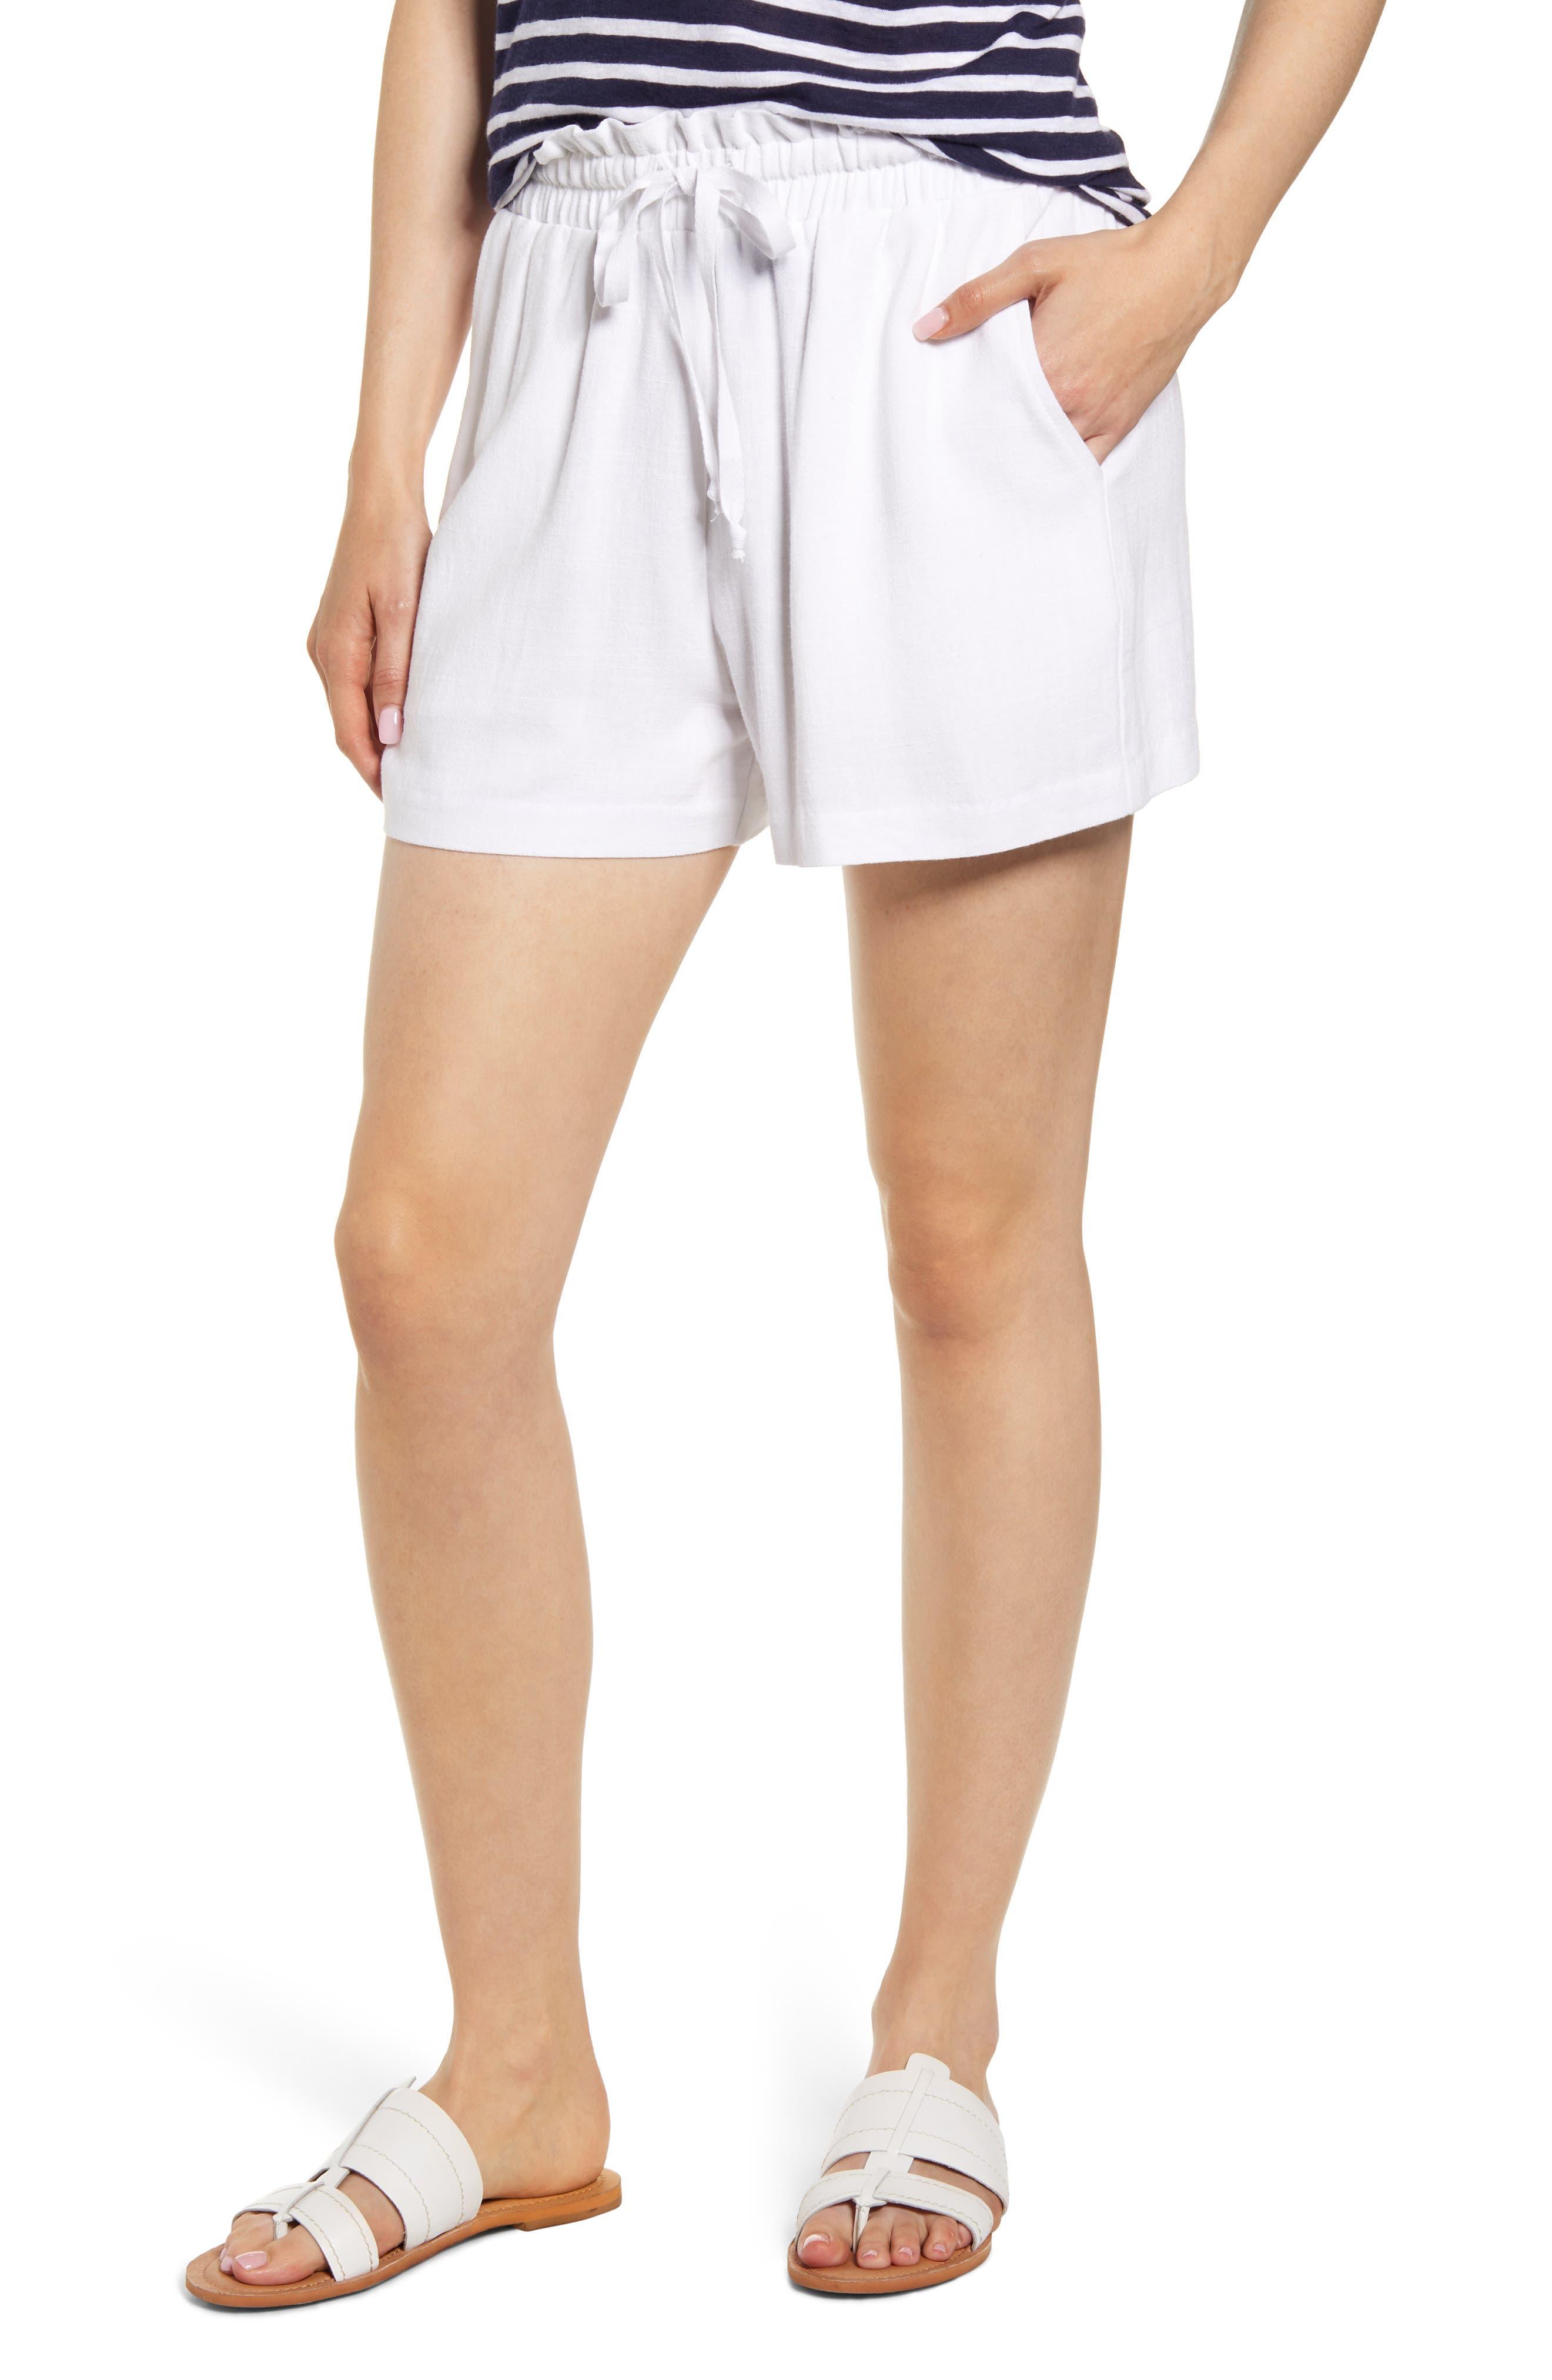 Women's Gibson X Hi Sugarplum! Hydra Drawstring Shorts